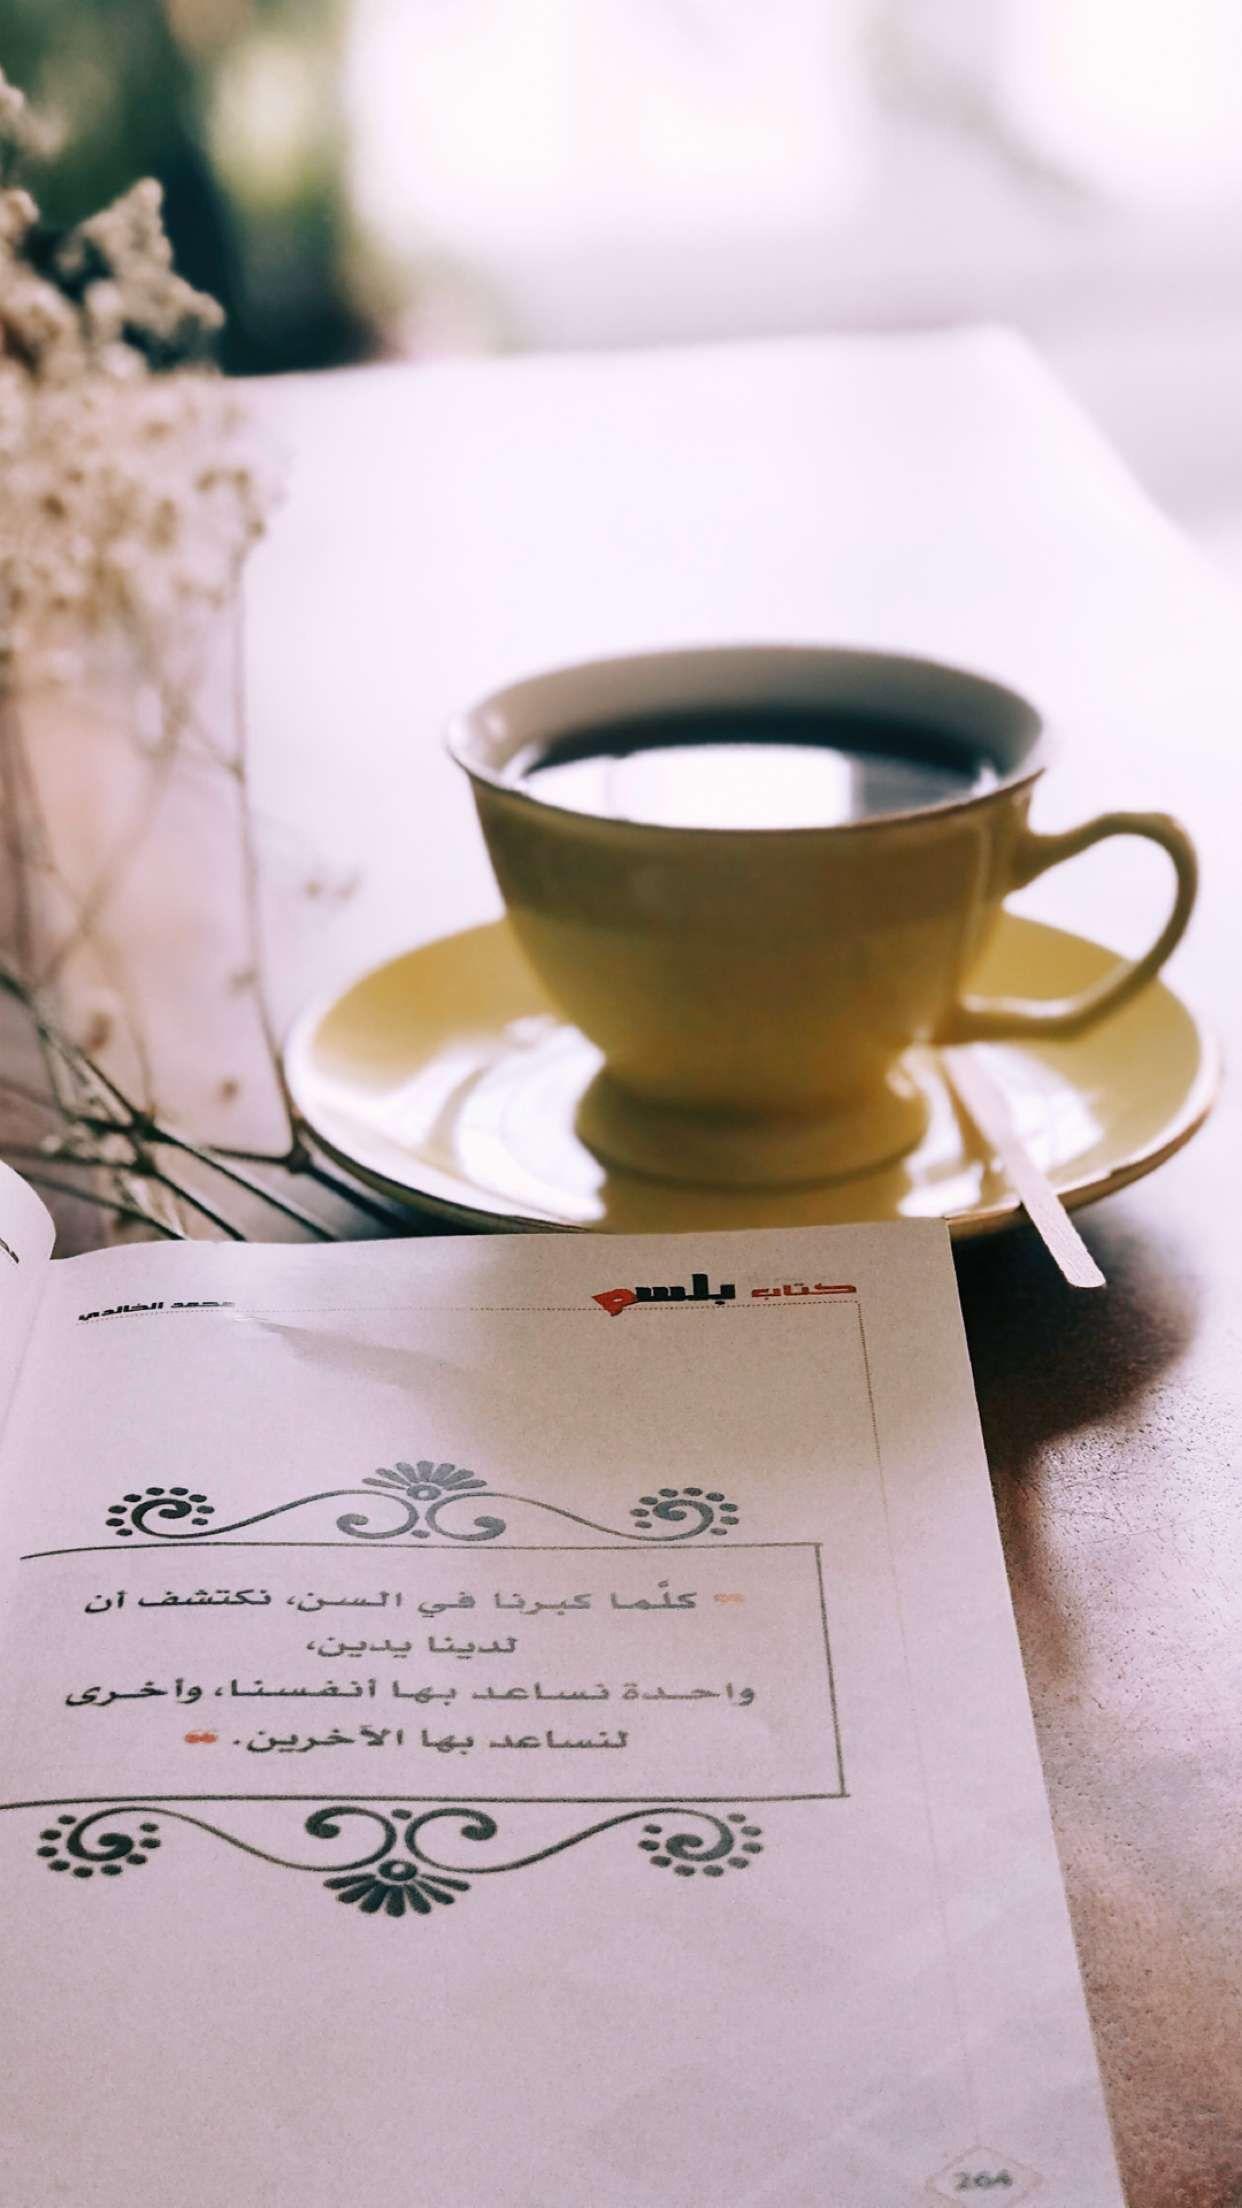 Pin By Wafa Farsi On رمزيات In 2020 Tea Cups Glassware Tea